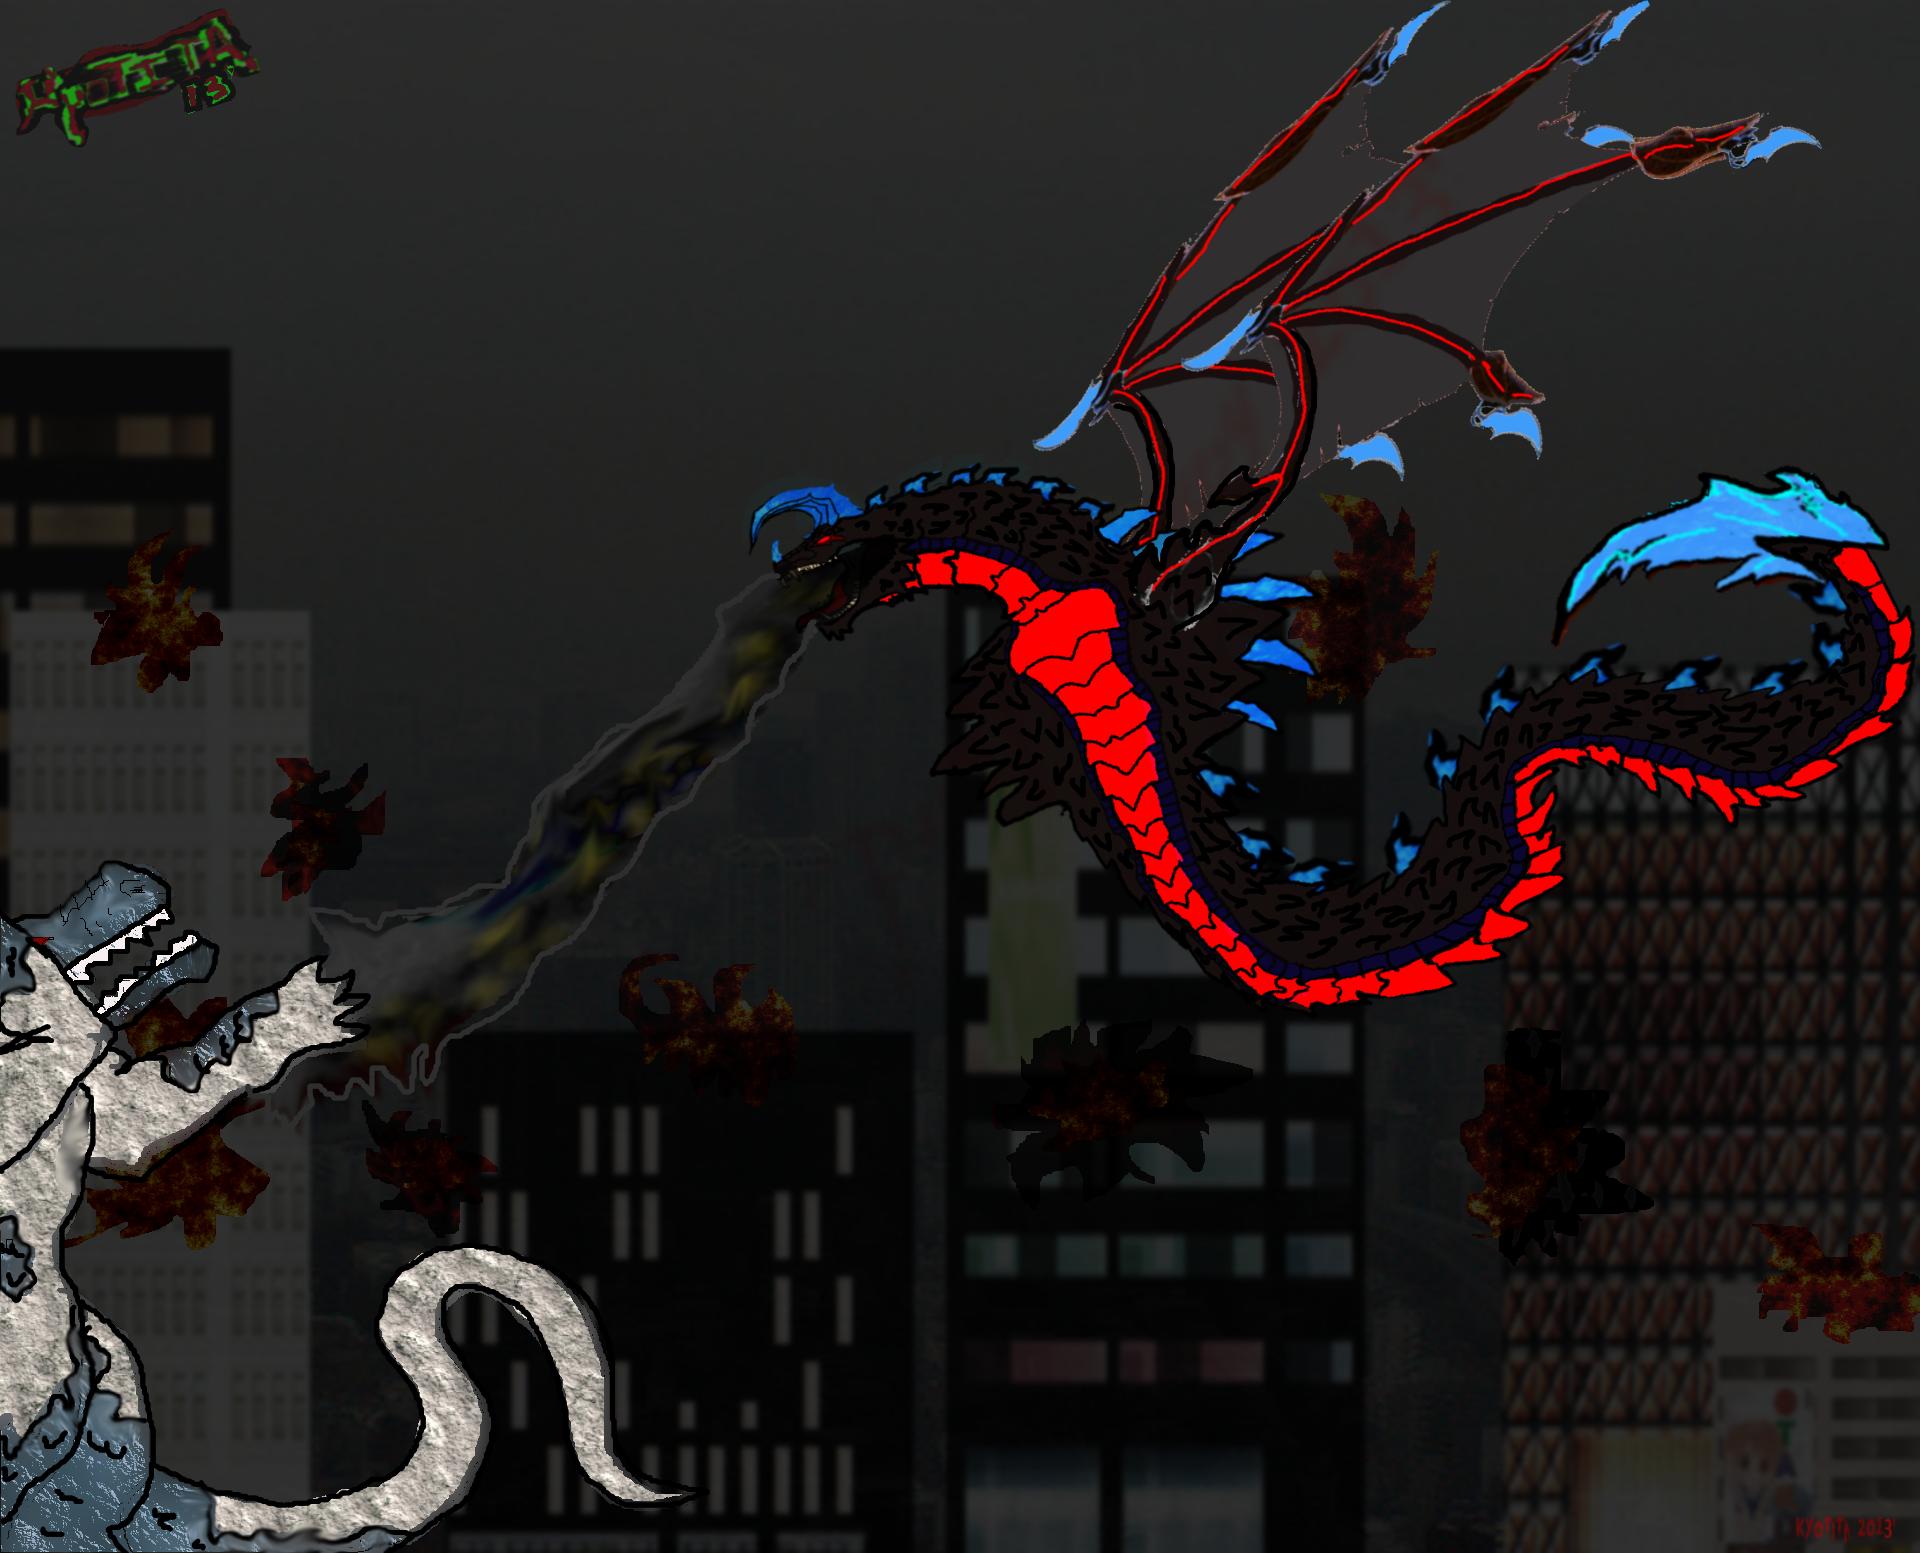 Kyotita breath weapon attack by Kyotita